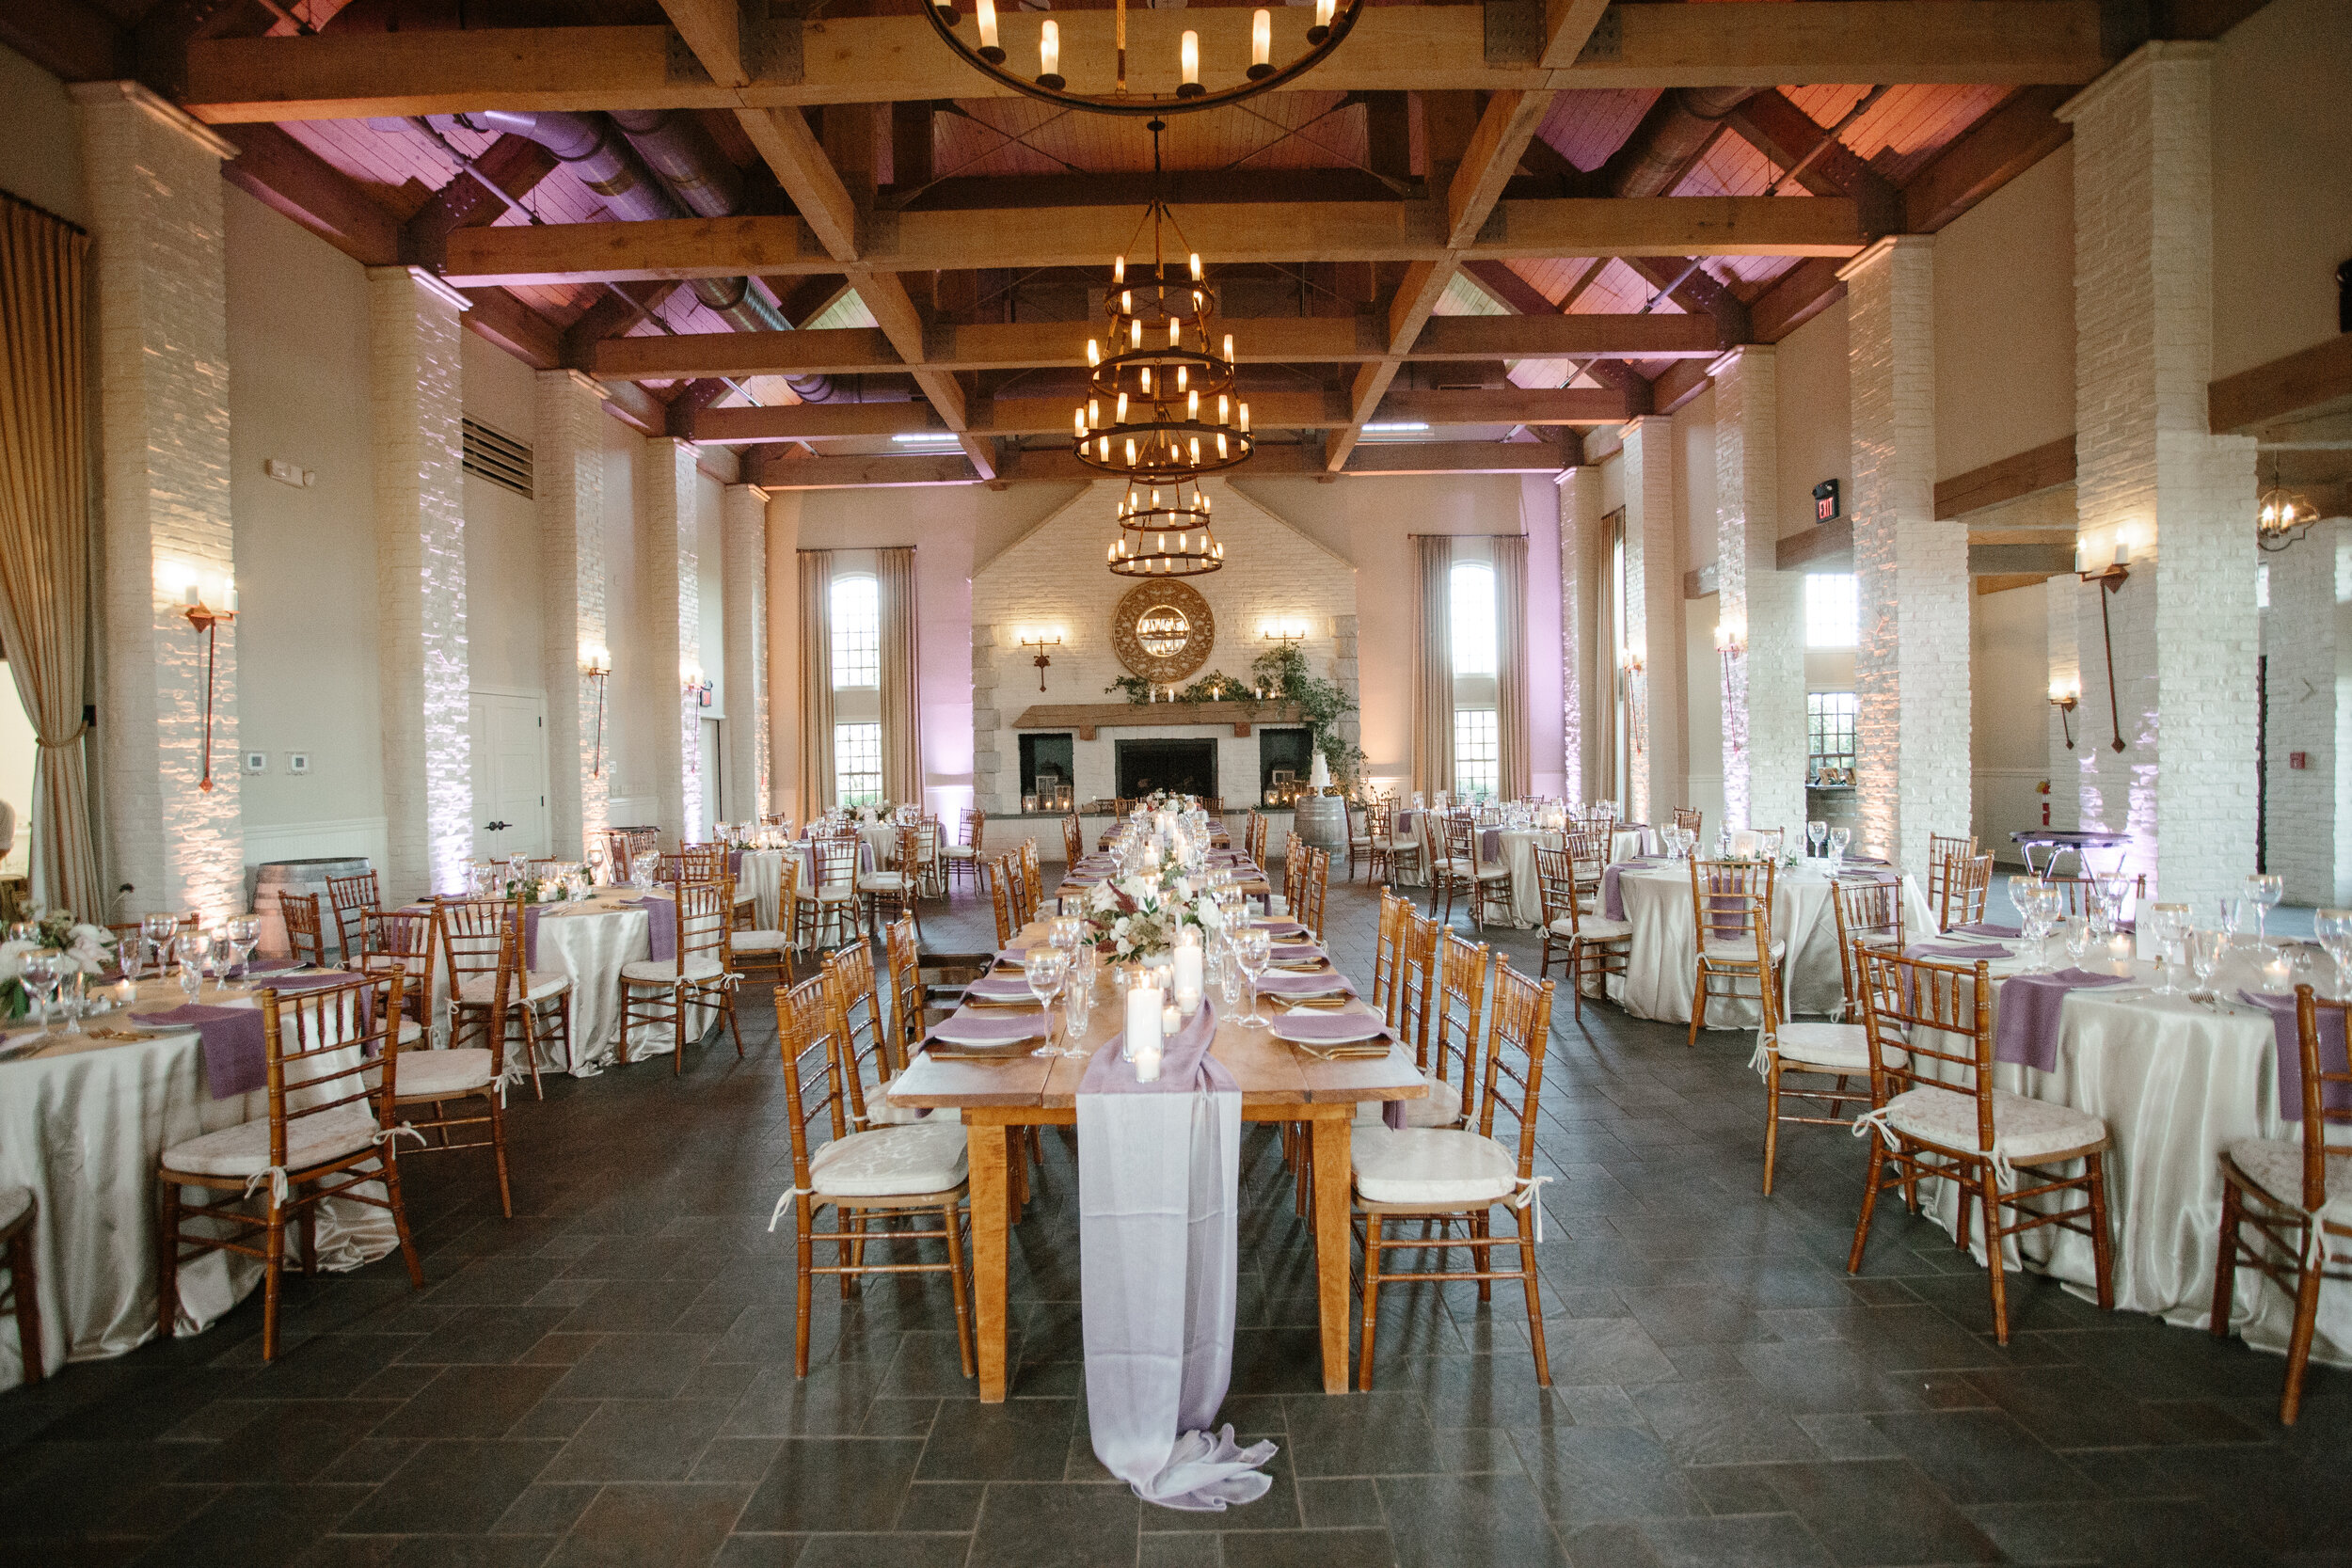 Shante-Asteway-Wedding-Andrew-Roby-Events-2.jpg